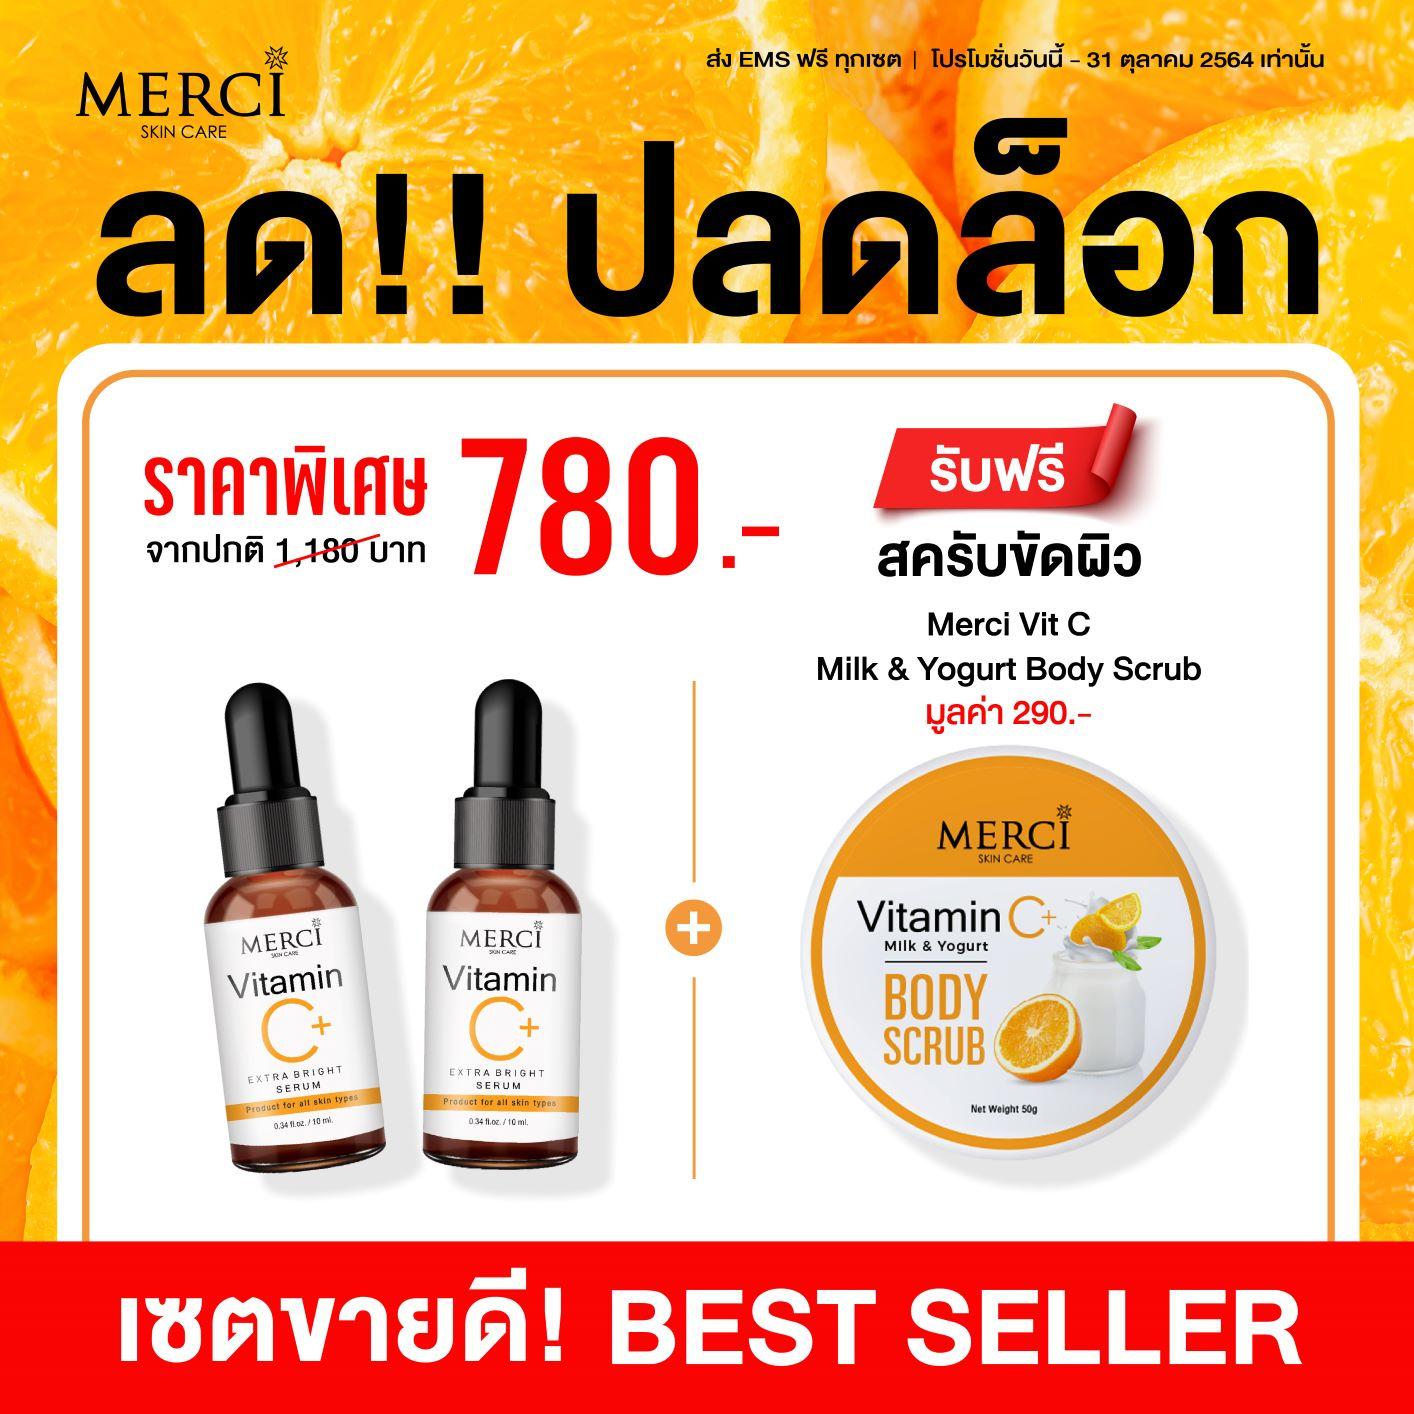 MERCI Vit C Serum x2    แถมฟรี !!!  Merci Vit C Milk & Yogurt Body Scrub  มูลค่า 290บาท